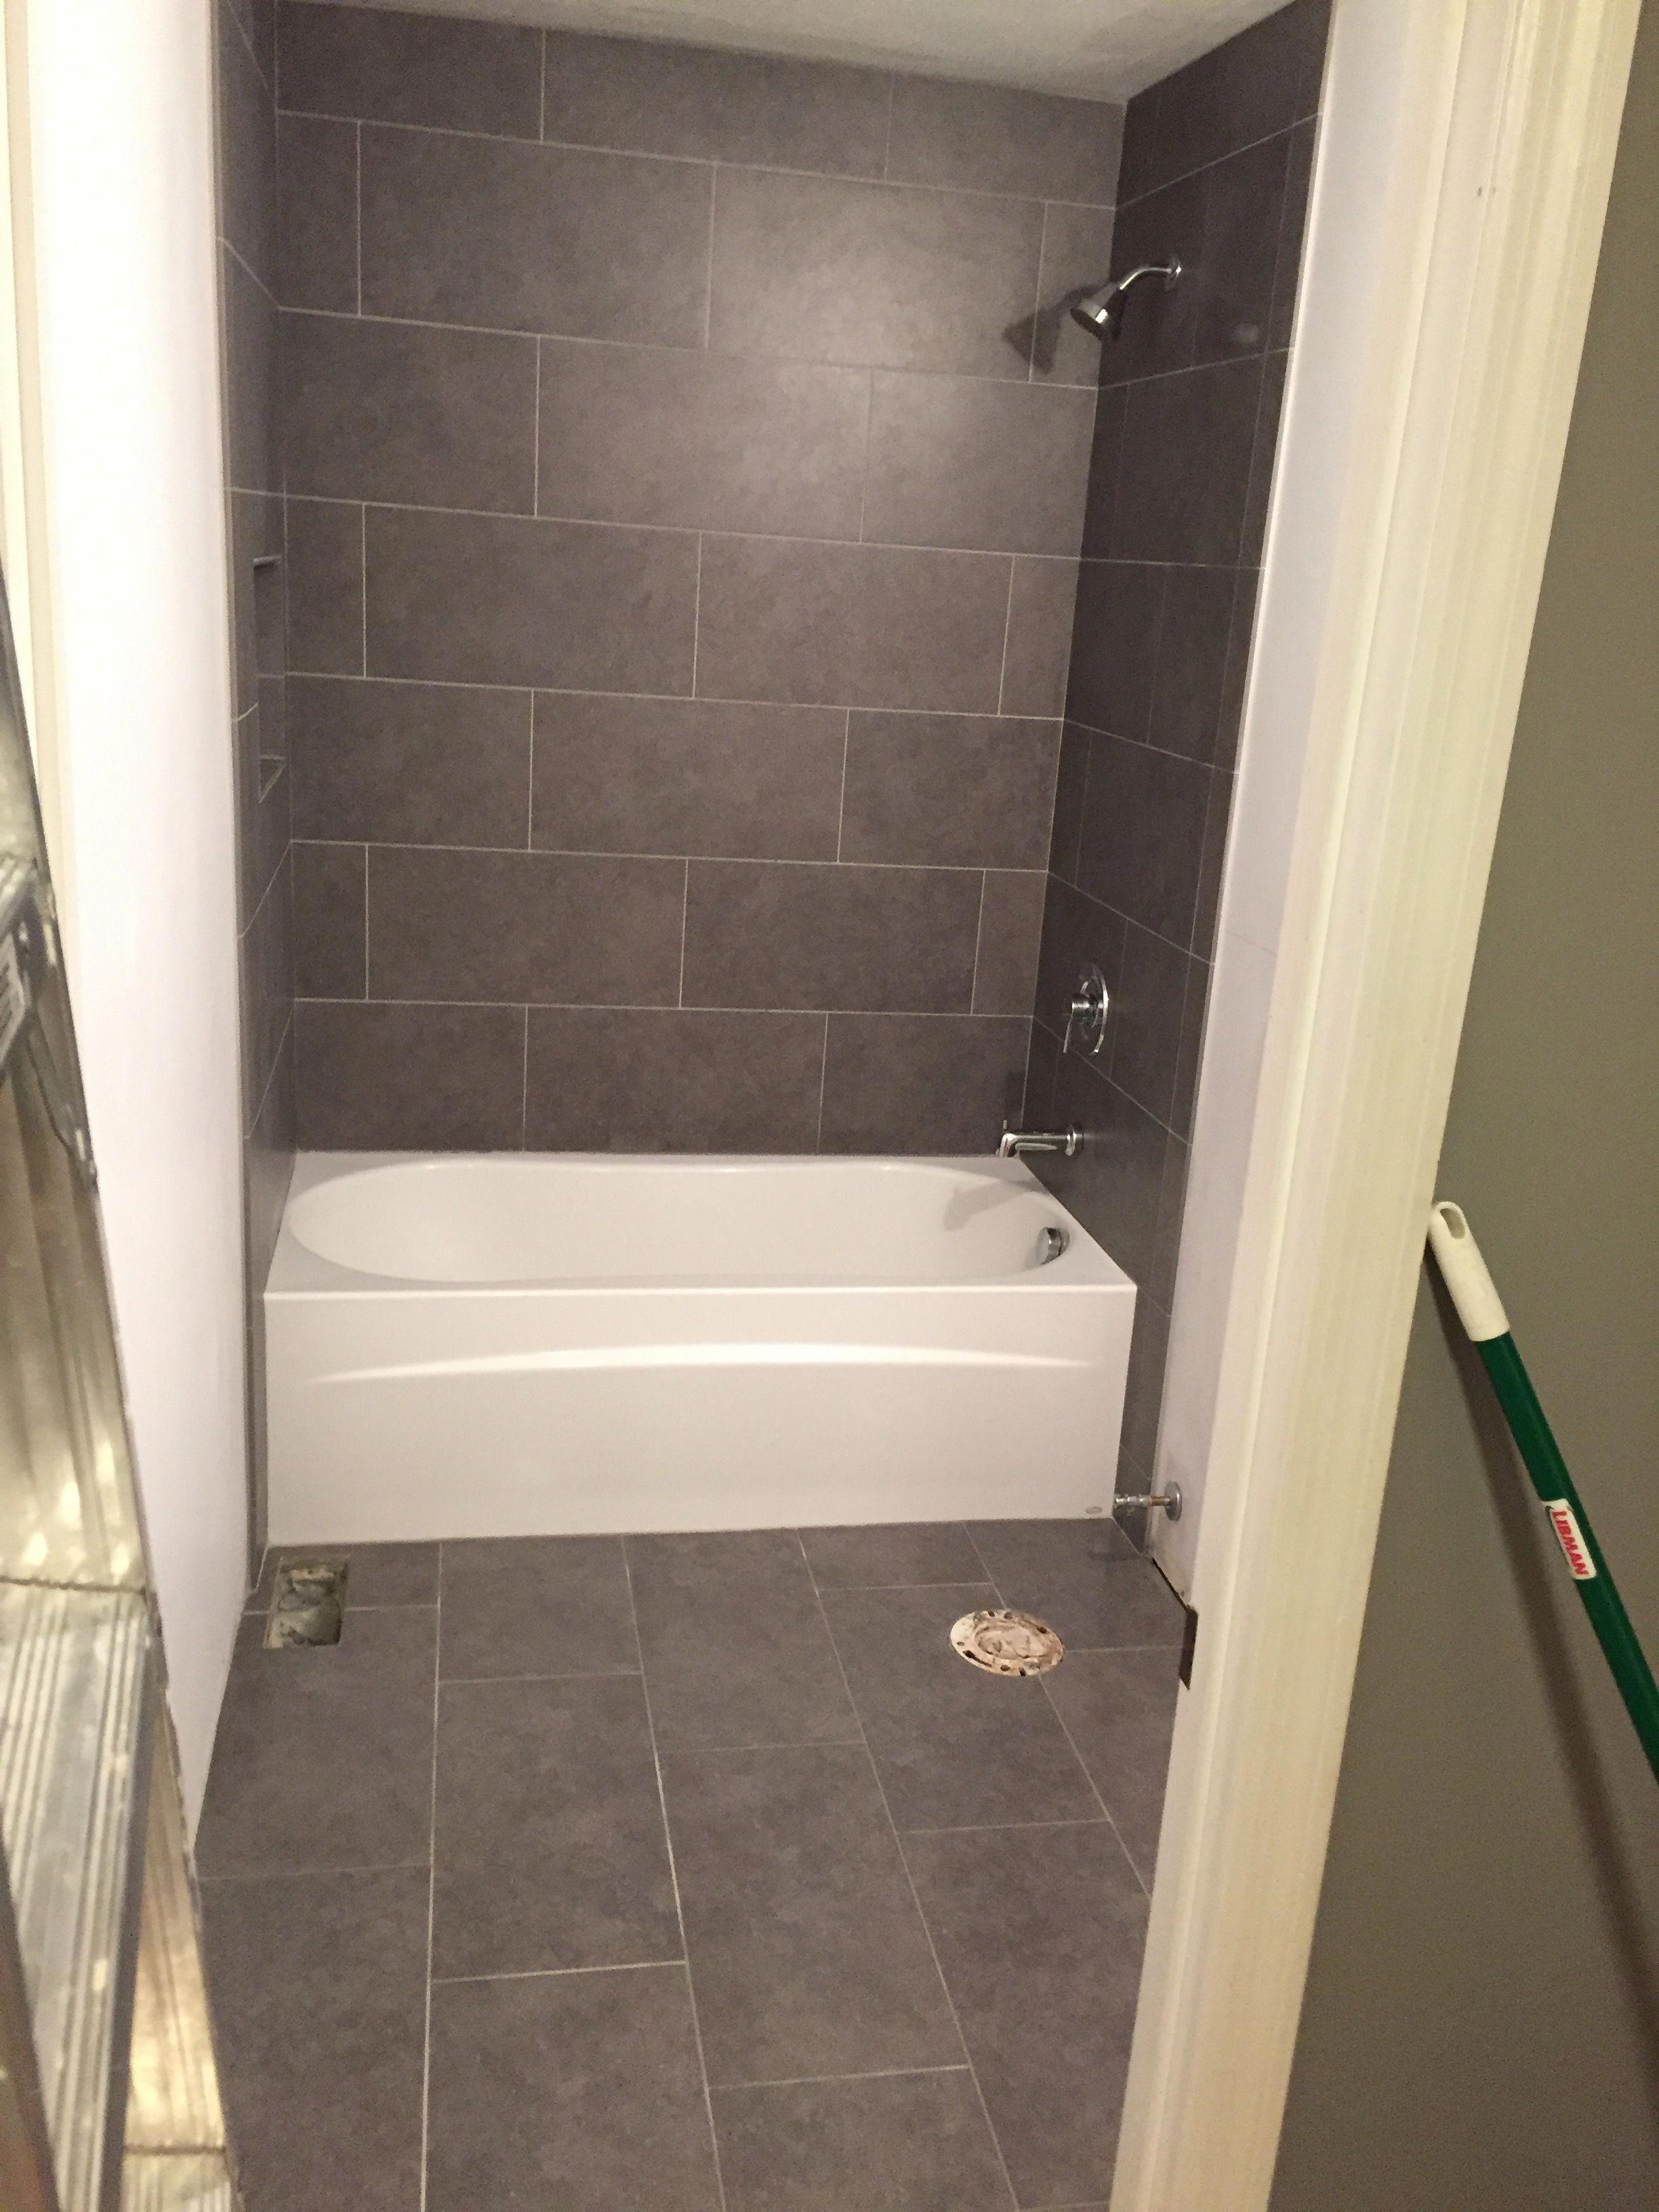 How To Lay Bathroom Tile Floor Over Plywood Surface Bathroomtilefloorkids Tile Tub Surround Top Bathroom Design Small Bathroom